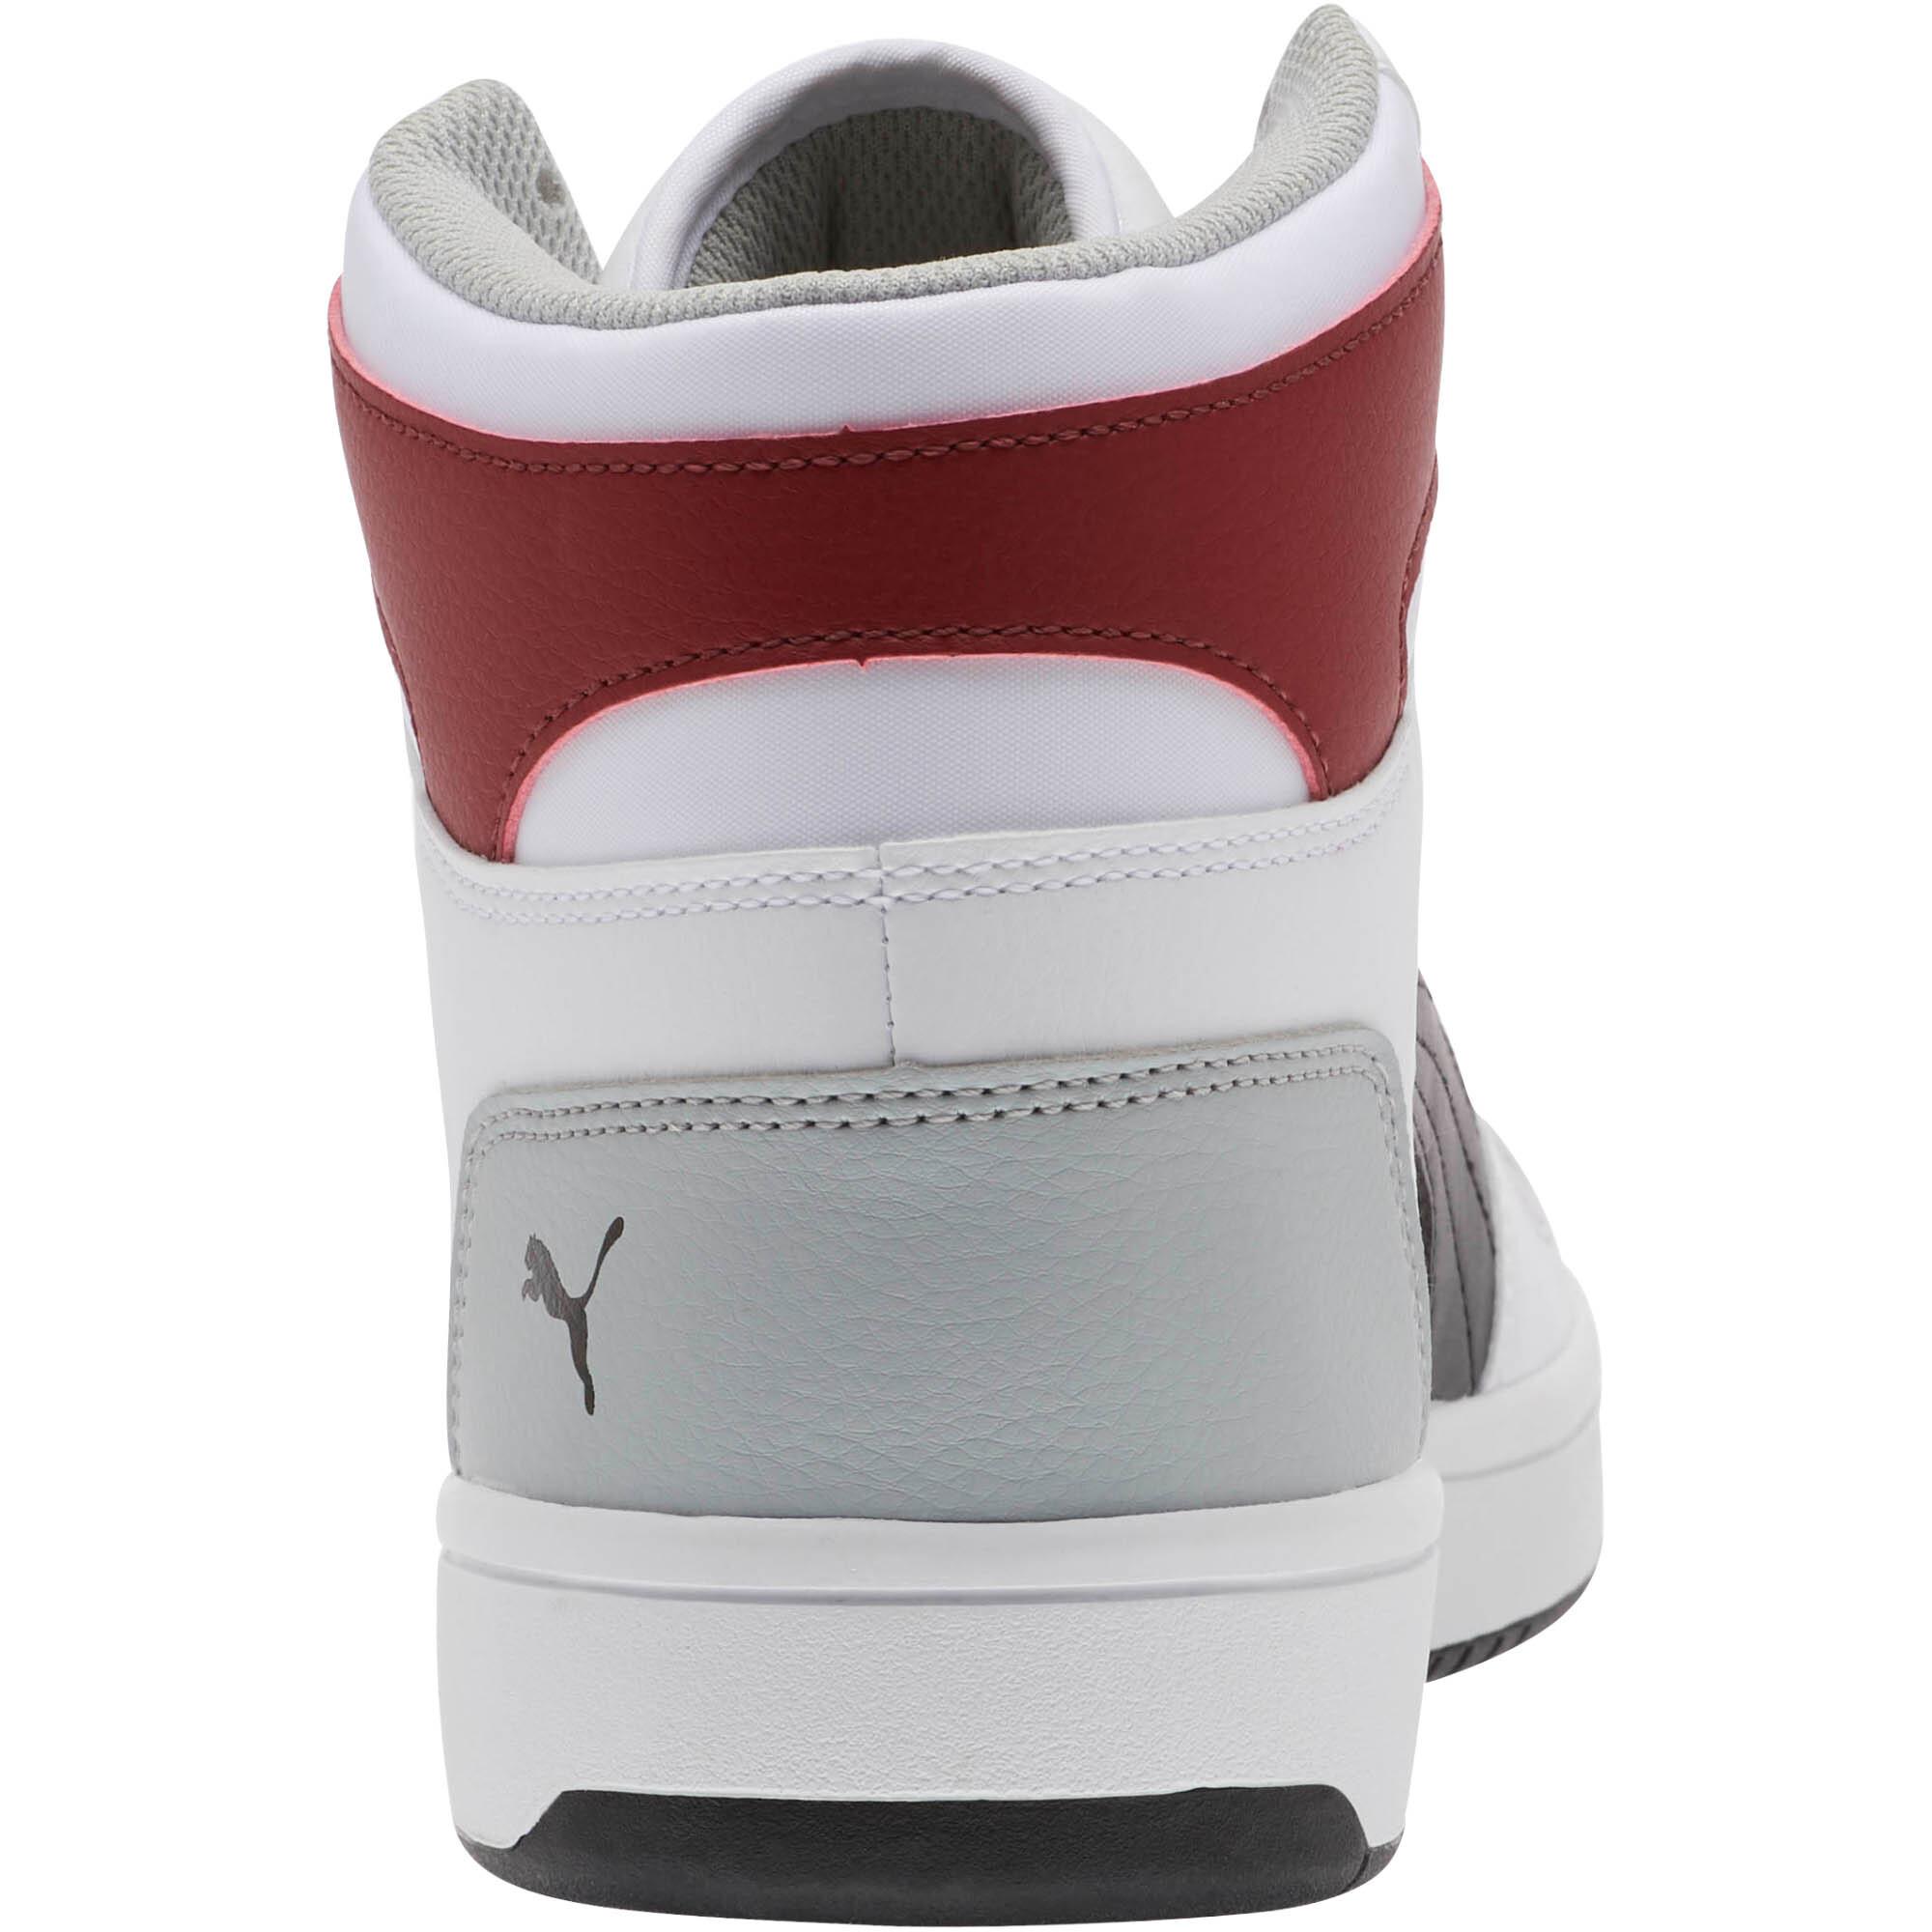 PUMA-PUMA-Rebound-LayUp-Men-039-s-Sneakers-Men-Mid-Boot-Basics thumbnail 8